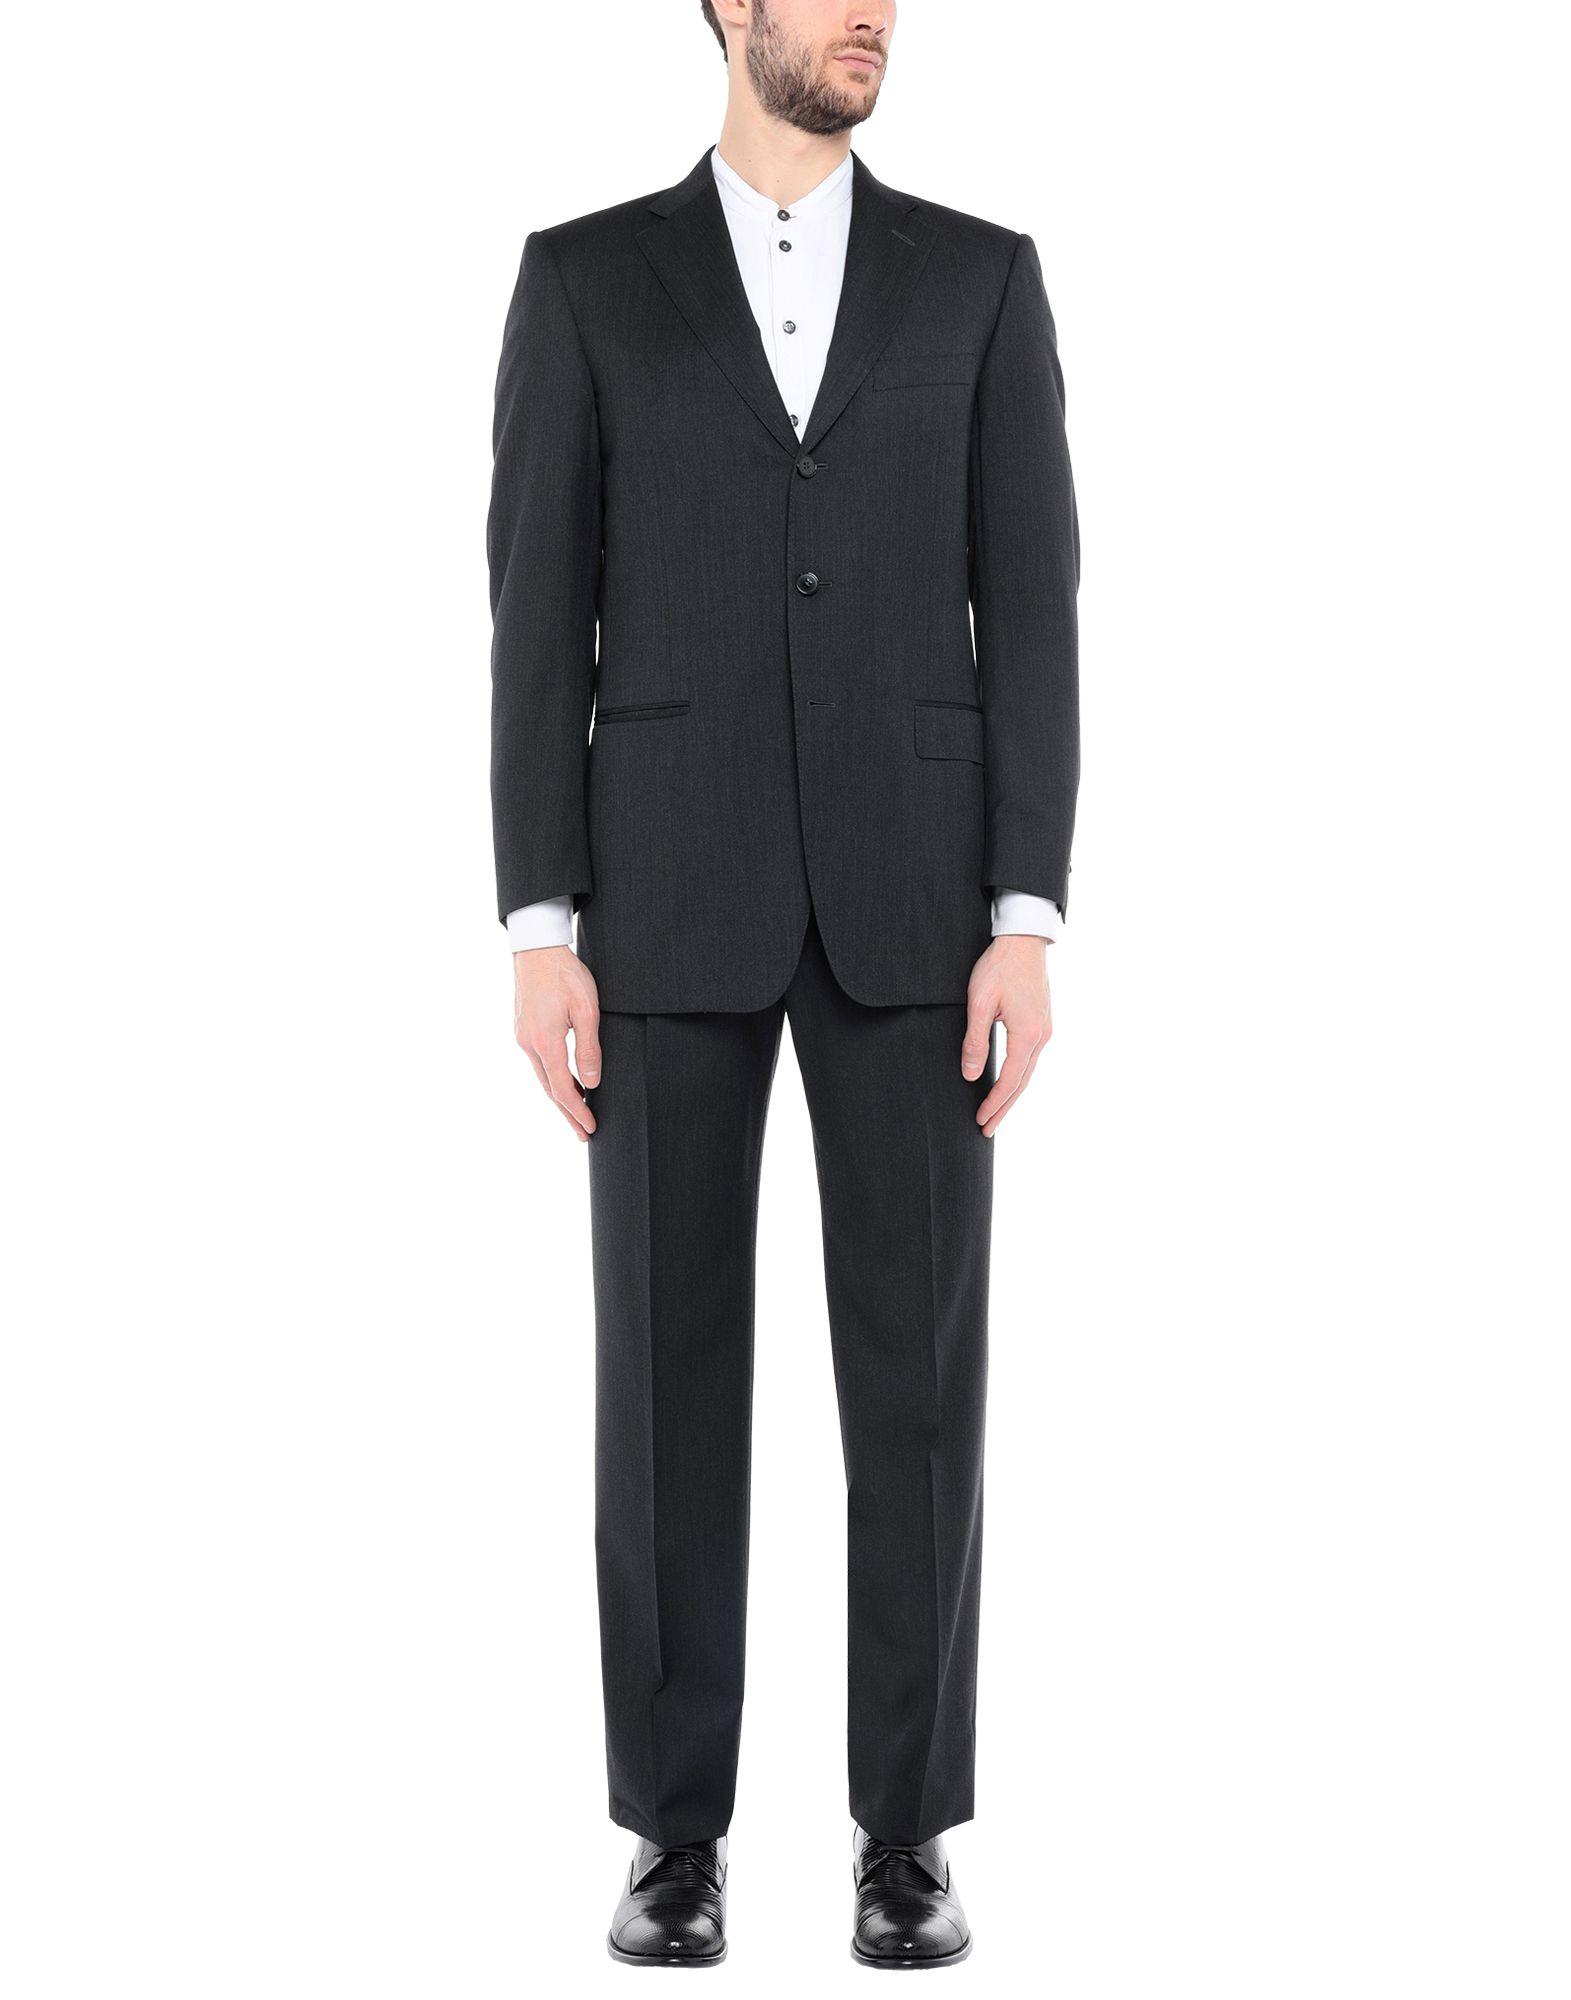 buy online e651b 8aa0c ERMENEGILDO ZEGNA Suits - Suits and Blazers | YOOX.COM